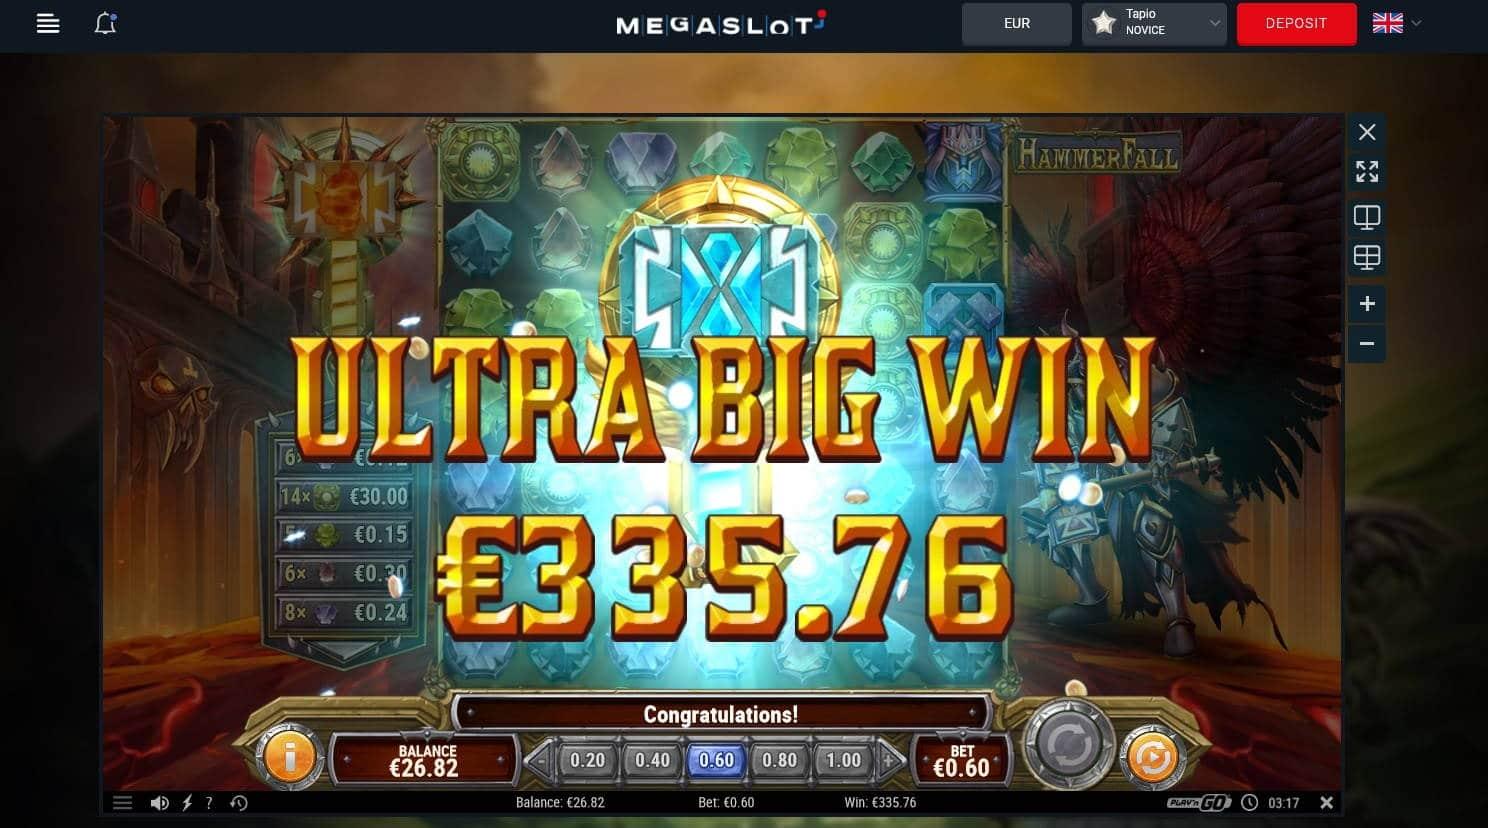 Hammerfall Casino win picture by MrMork 16.5.2021 335.76e 560X MegaSlot